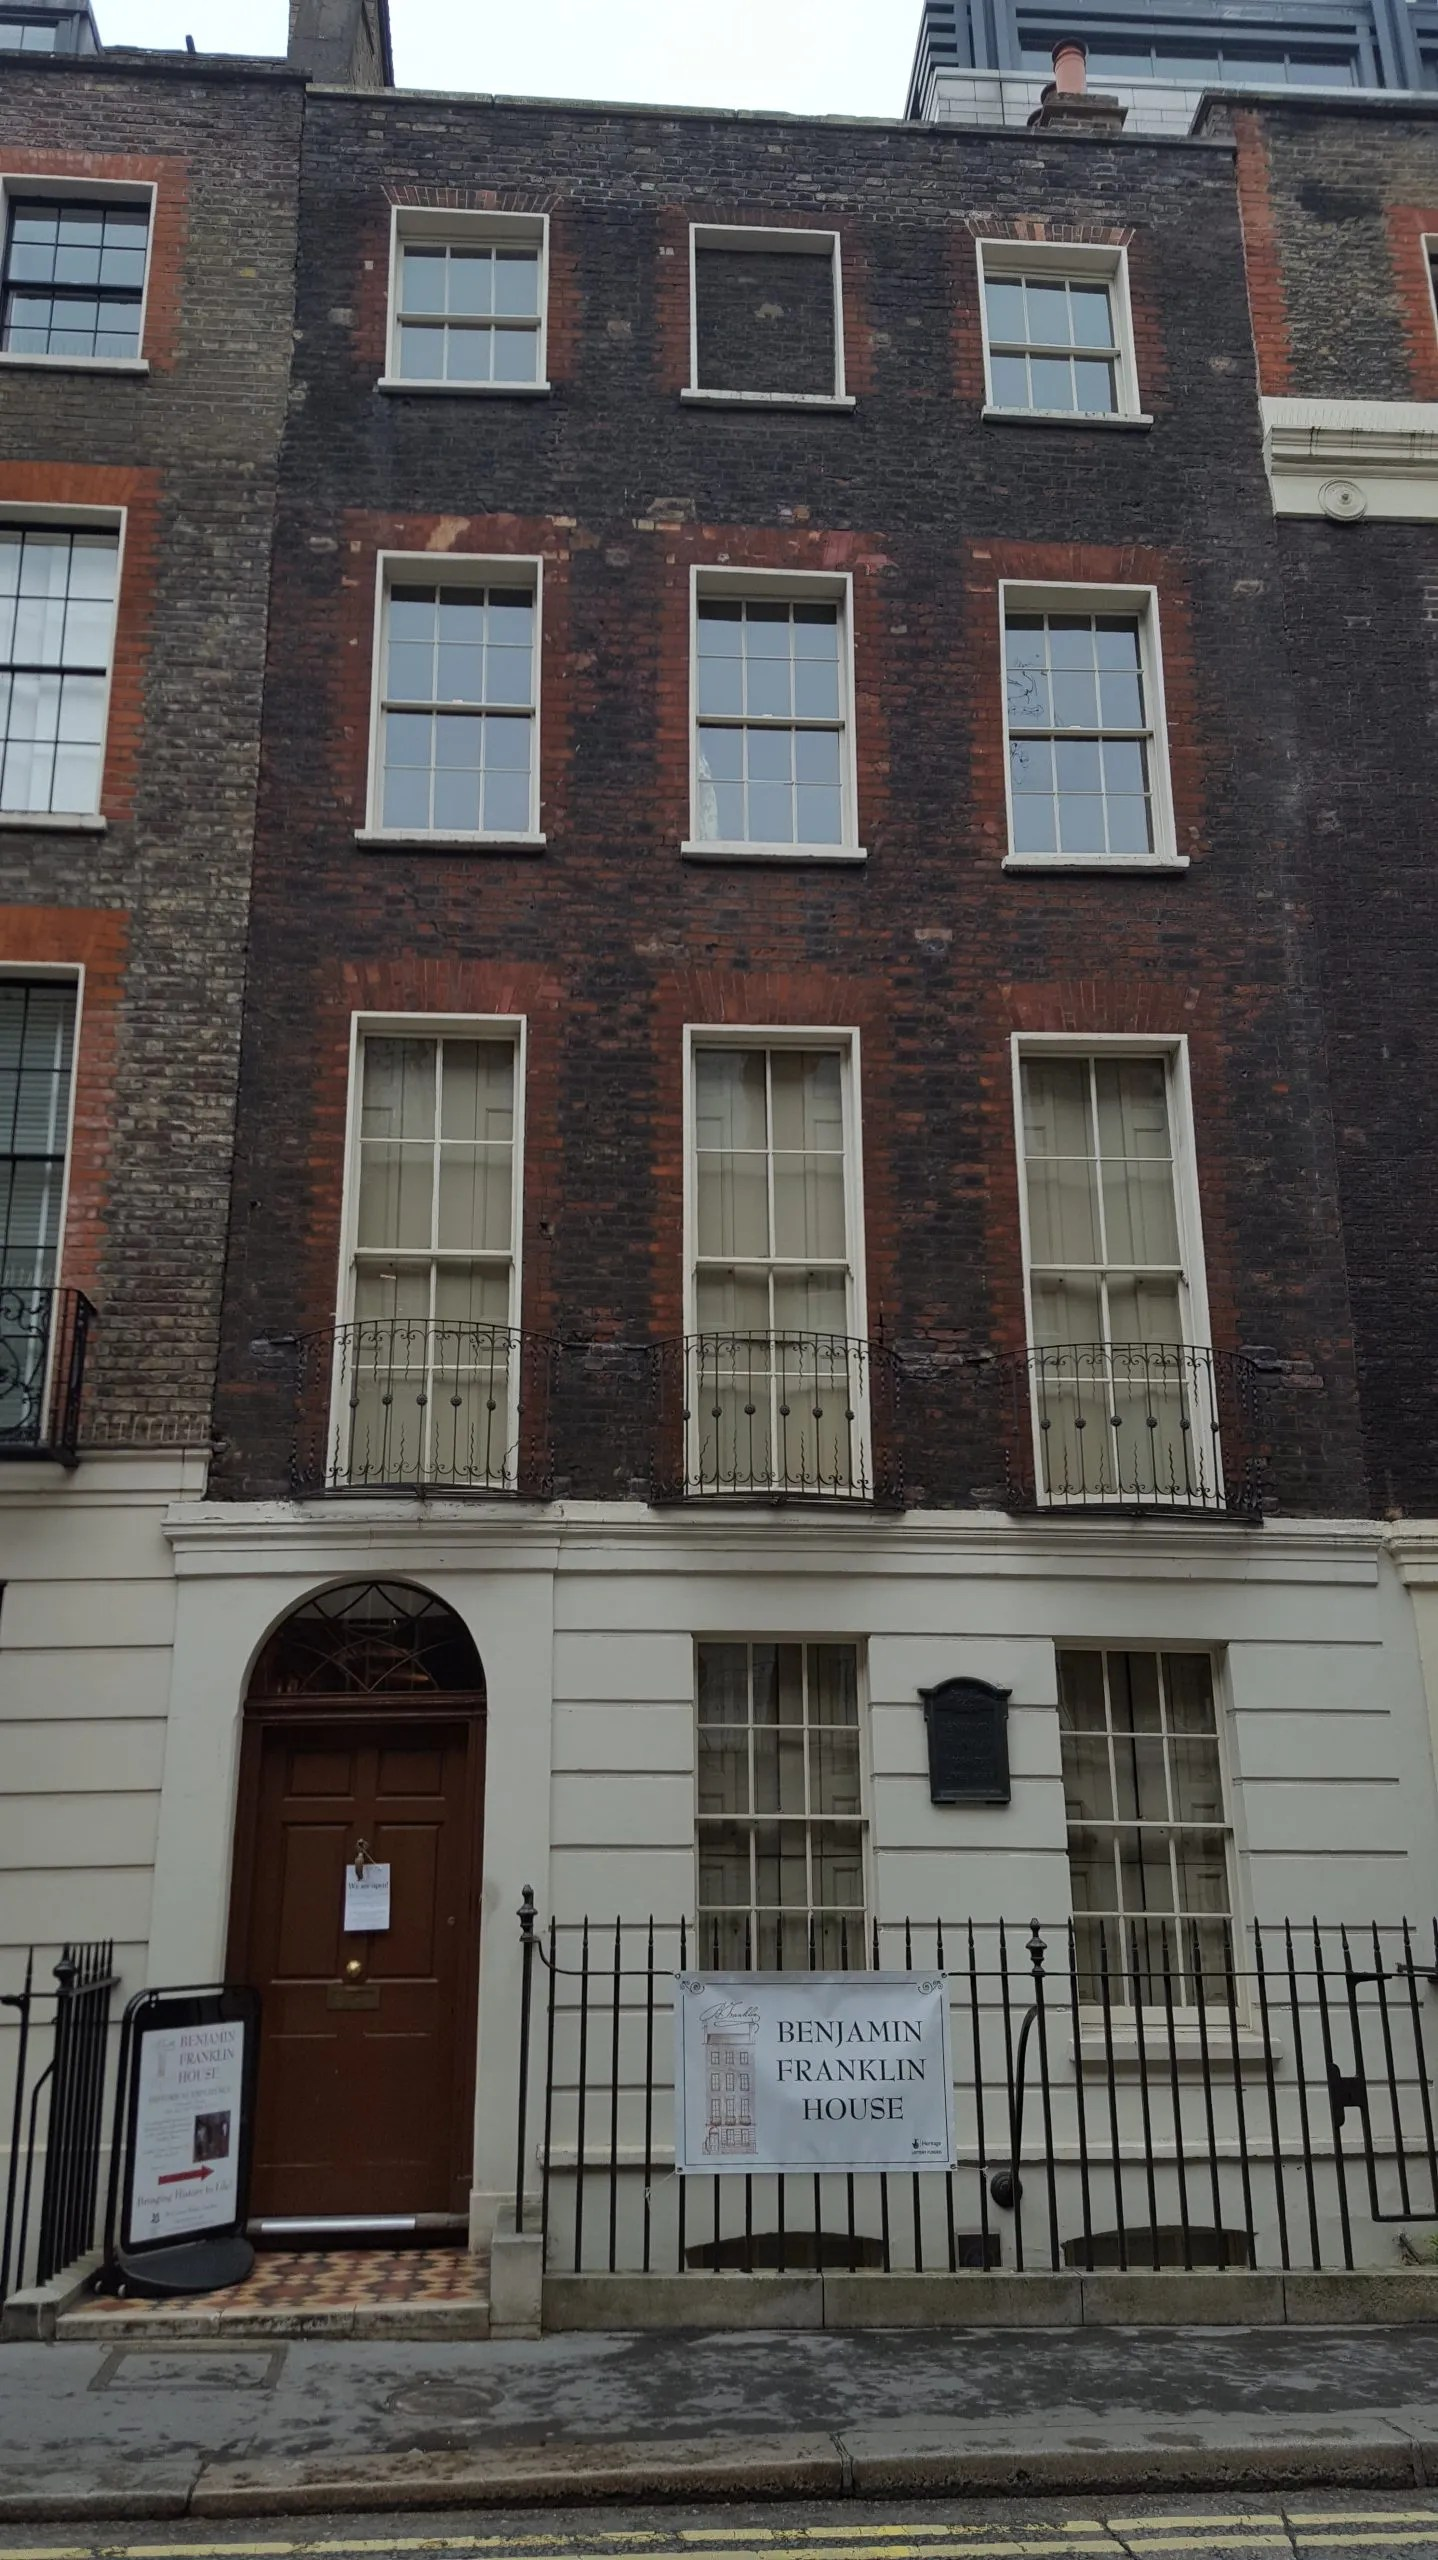 Benjamin Franklin House four storey Georgian house where Benjamin Franklin lived in London